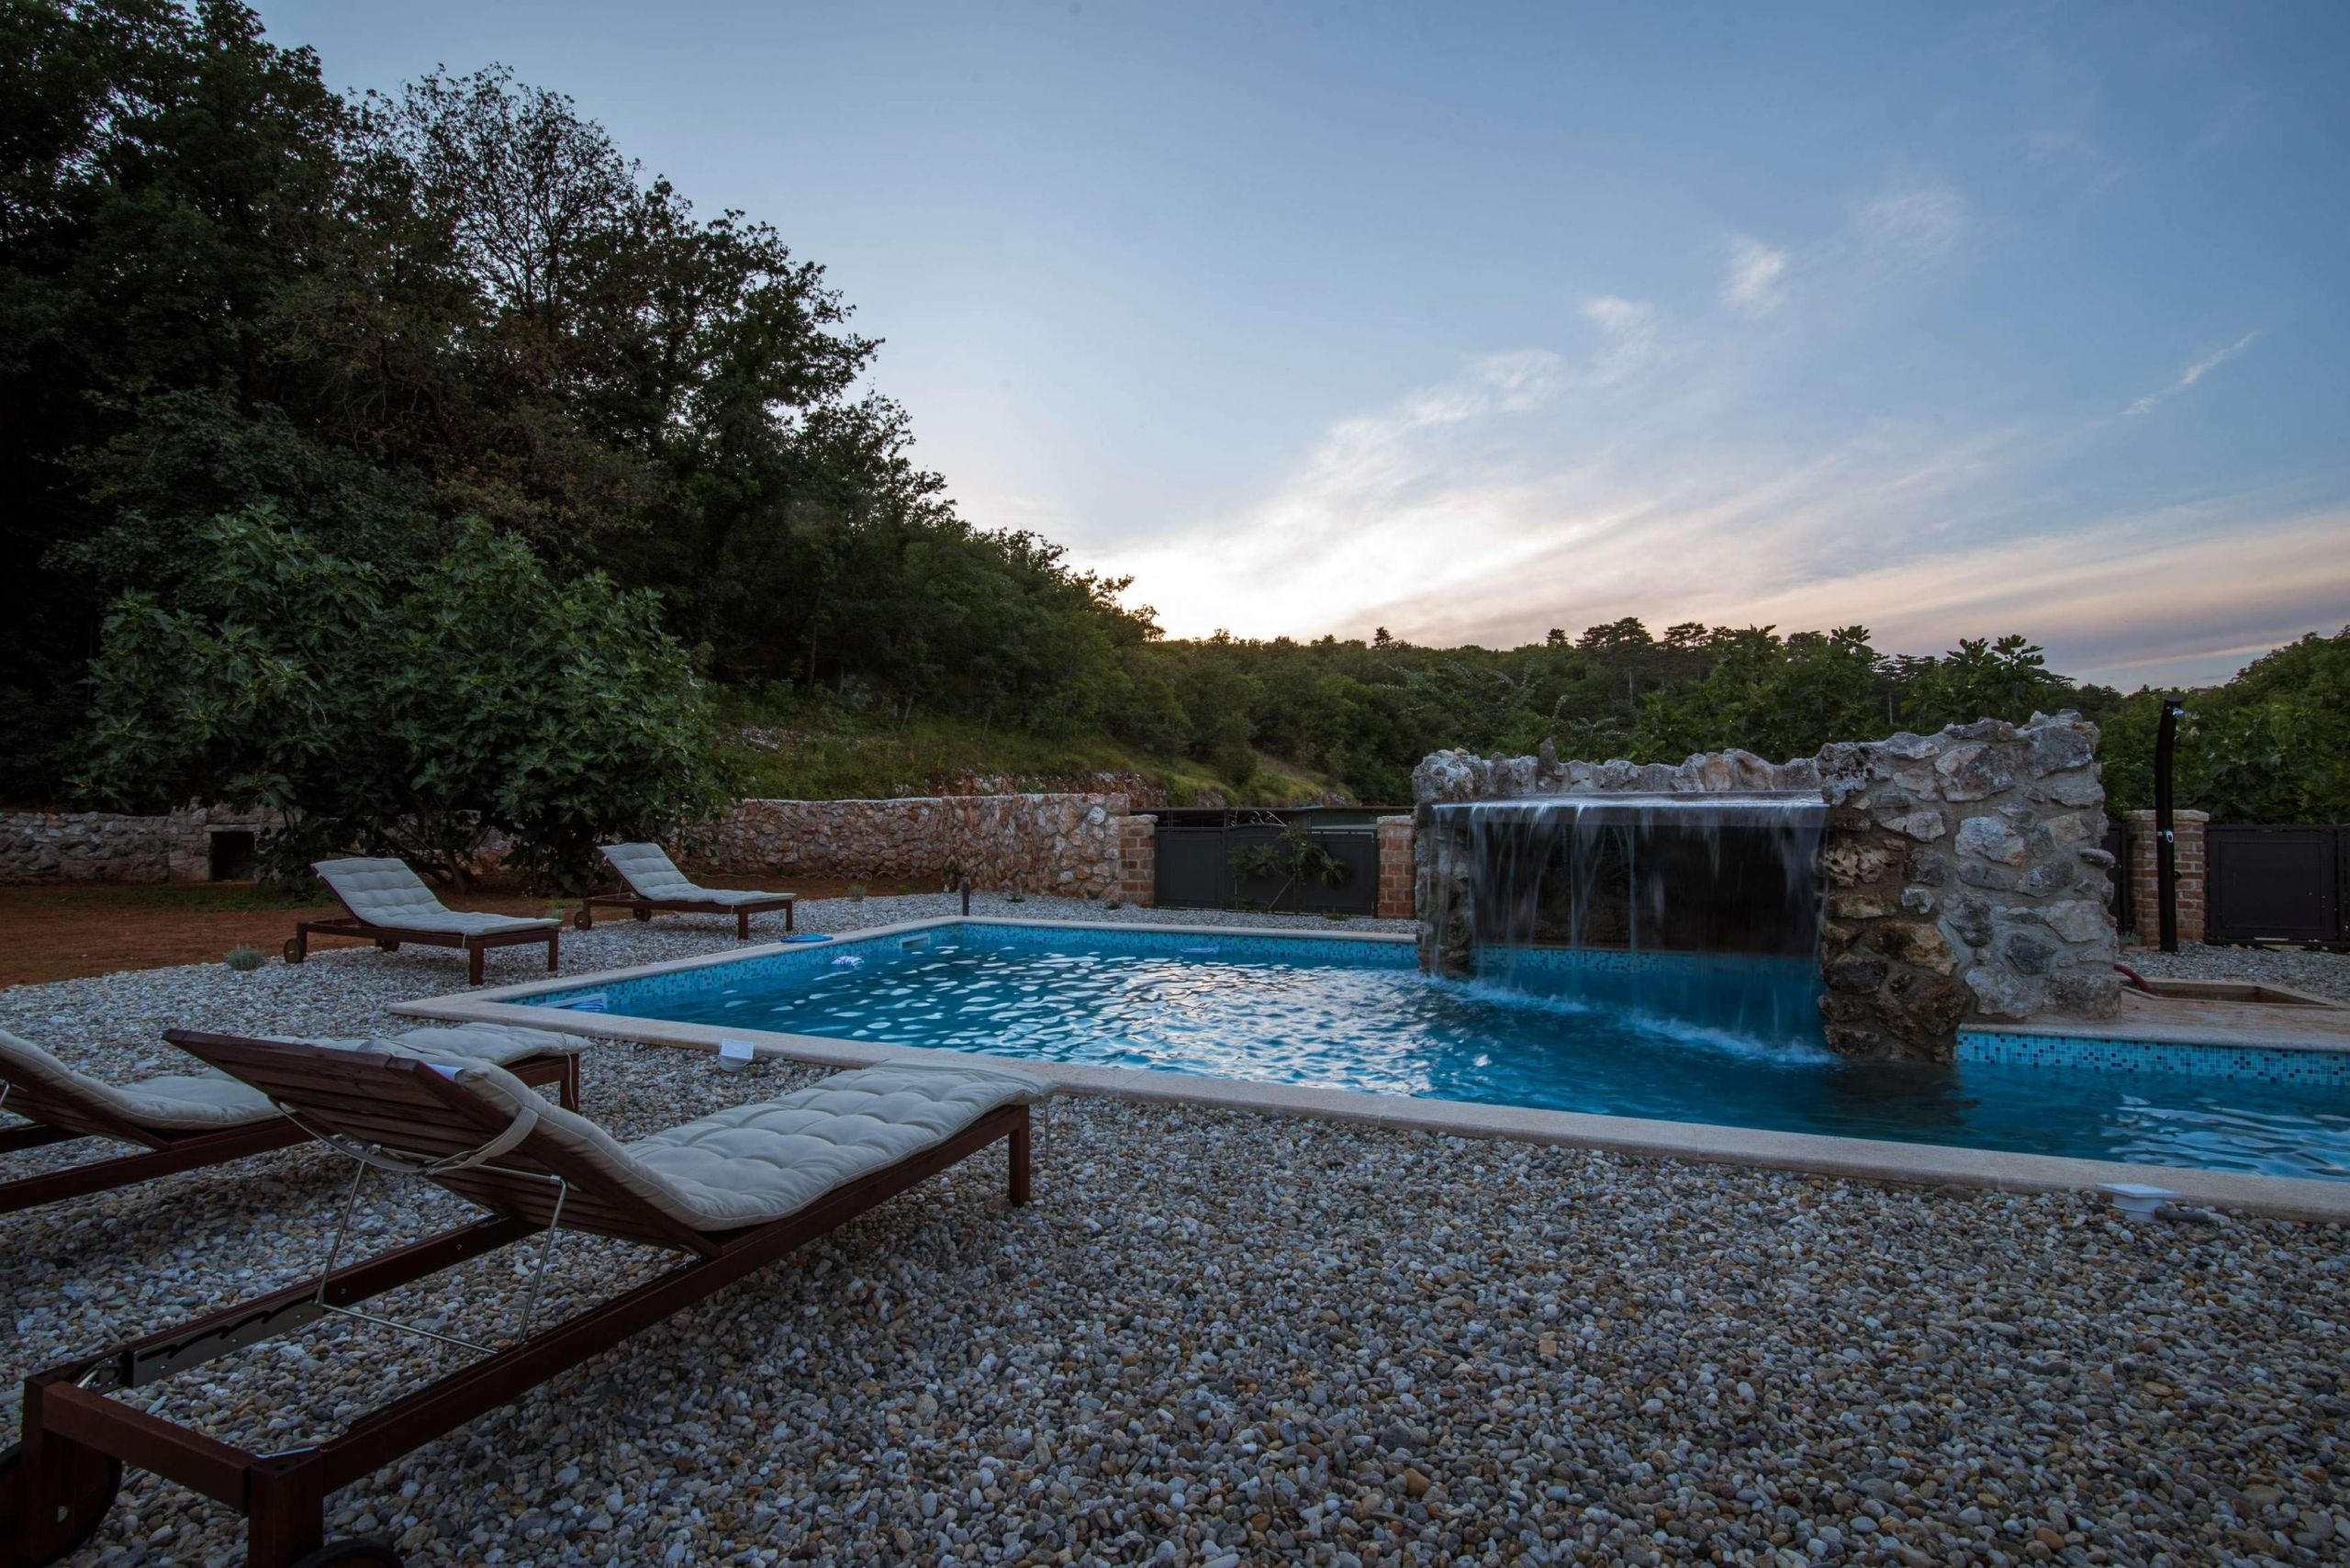 garten pools das beste von swimming pool design plans swimming pool swimming pool leipzig swimming pool leipzig